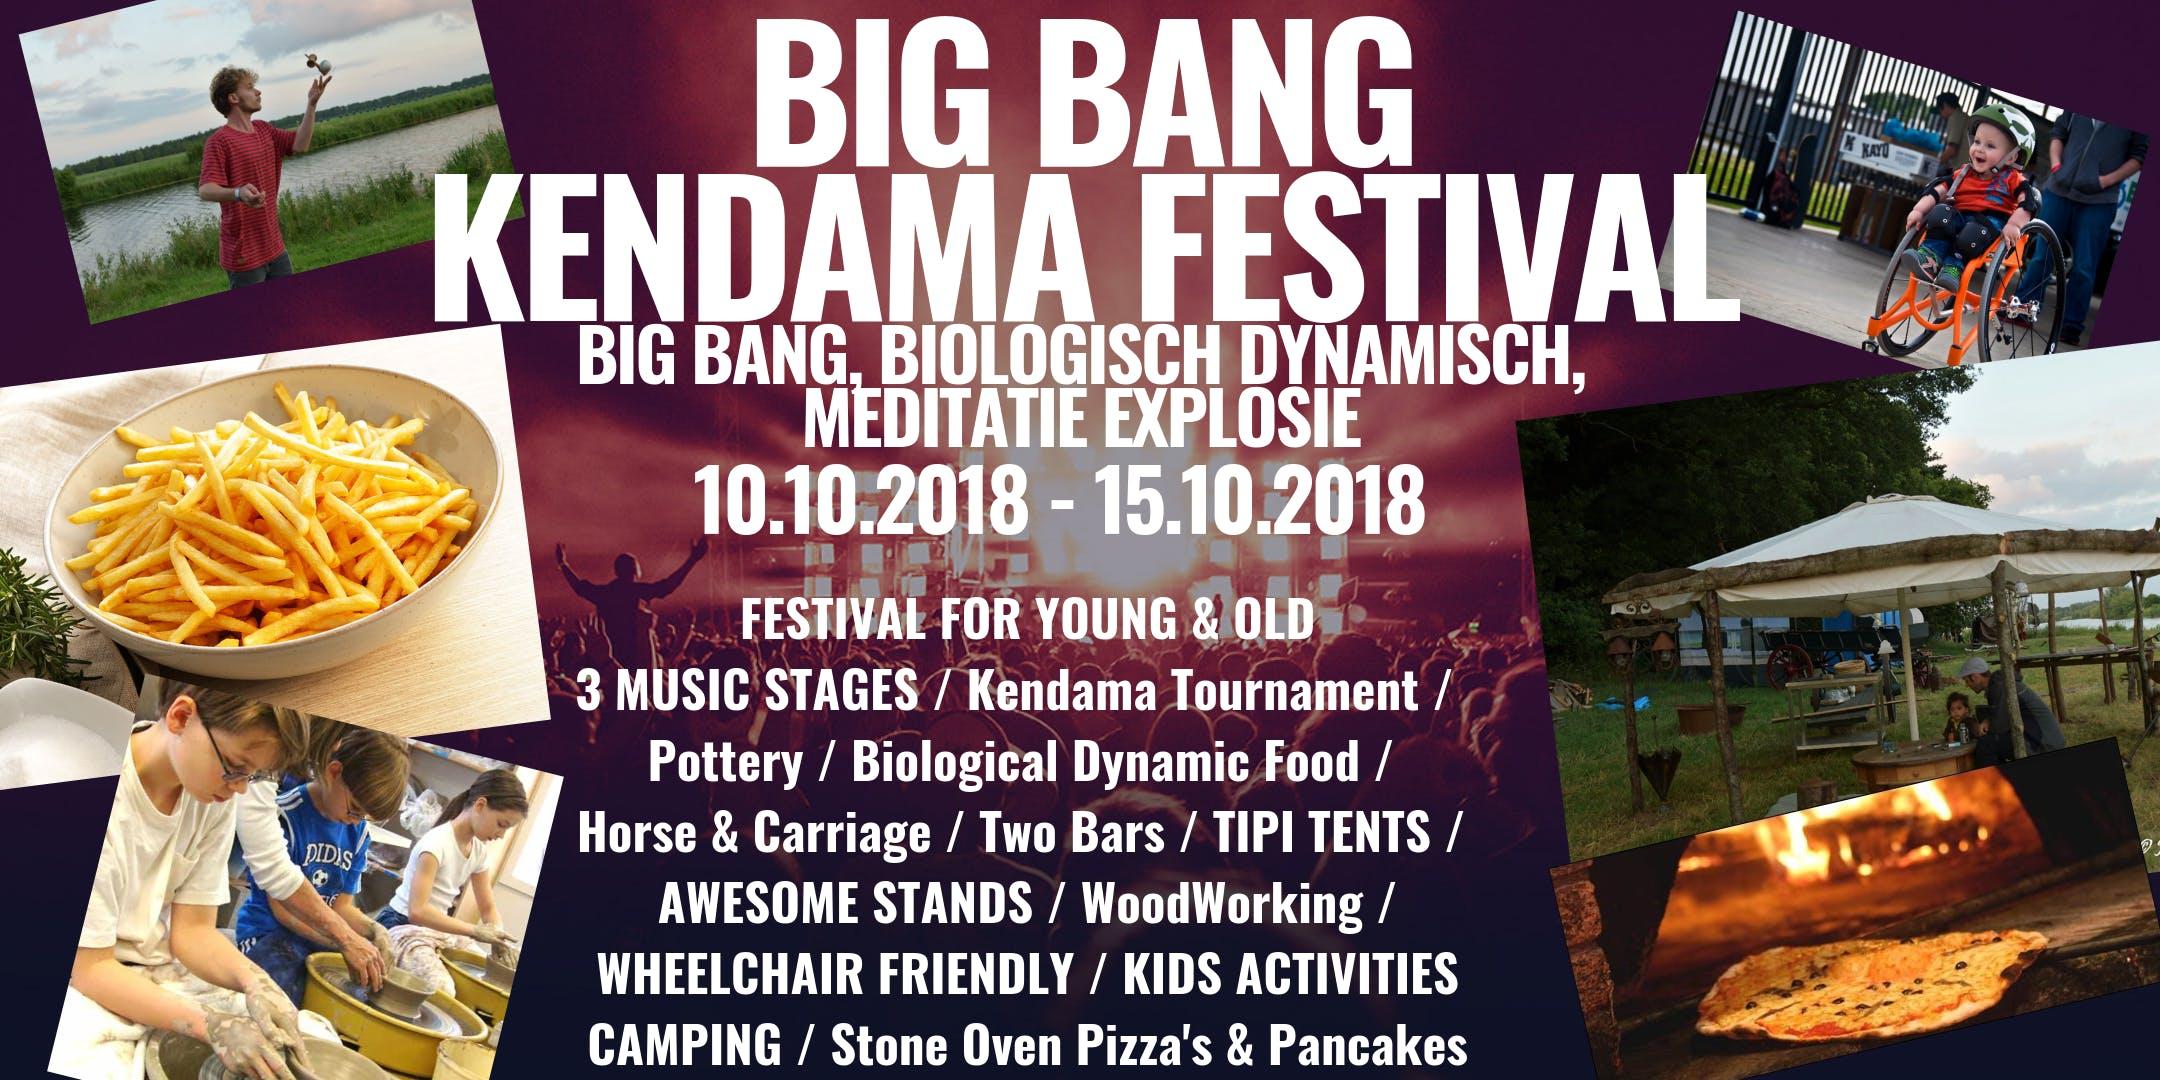 BIG BANG KENDAMA FESTIVAL